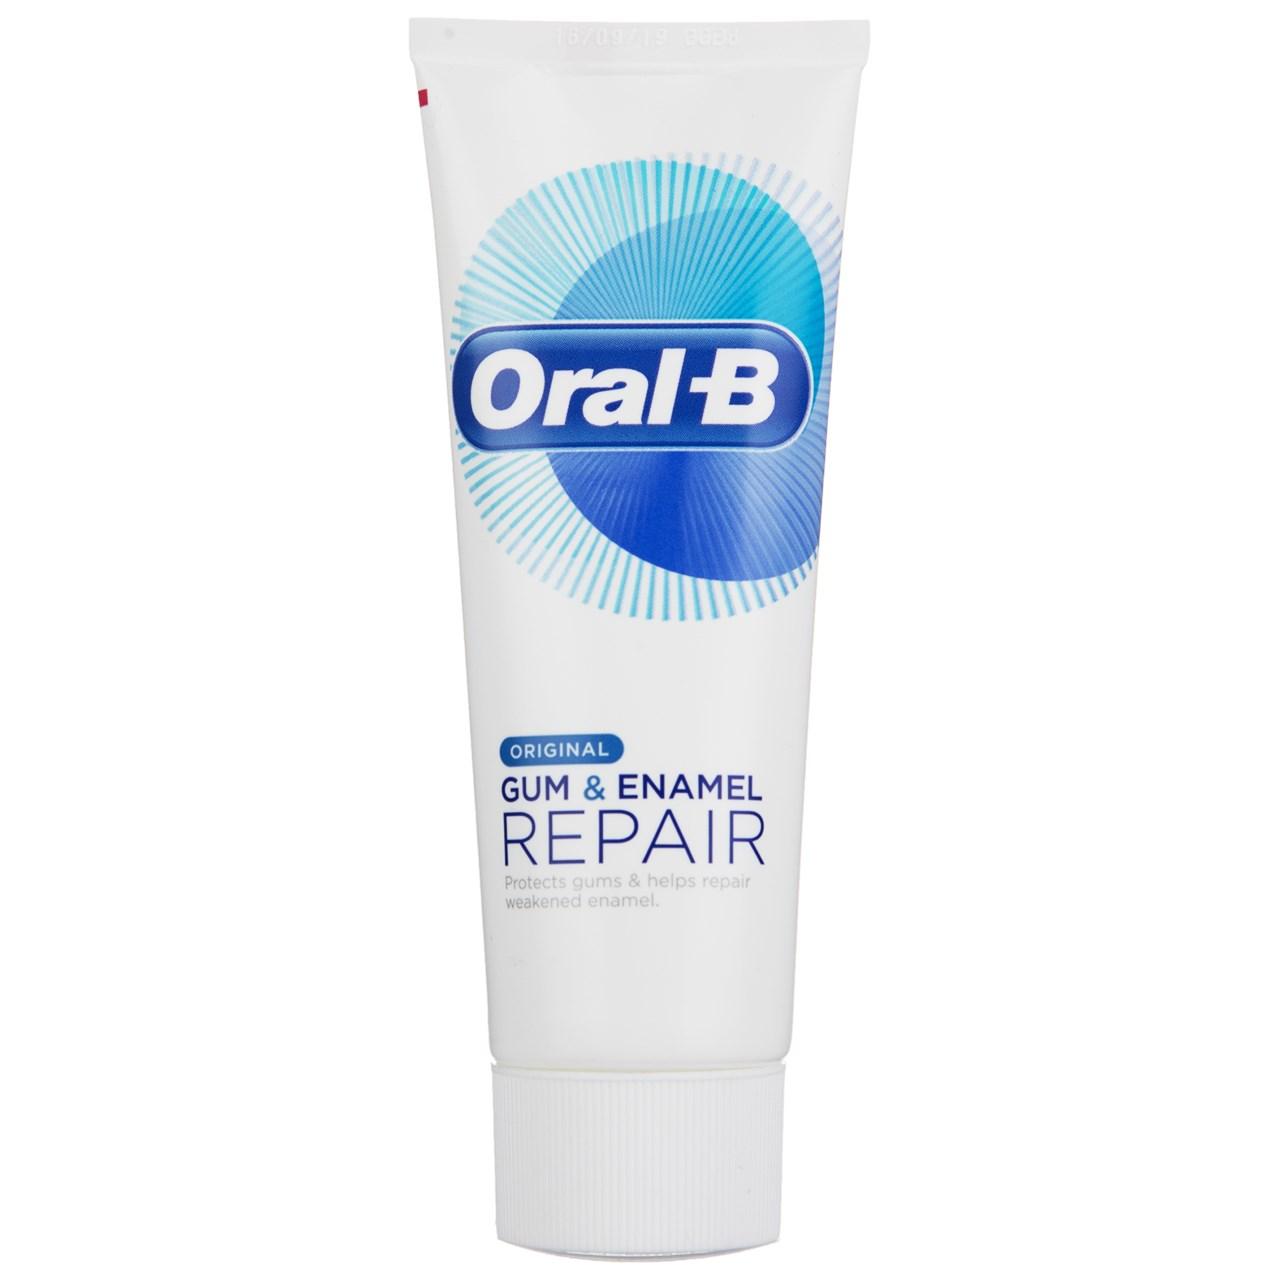 قیمت خمیر دندان اورال بی سری Gum And Enamel Repair مدل Original حجم 75 میلی لیتر